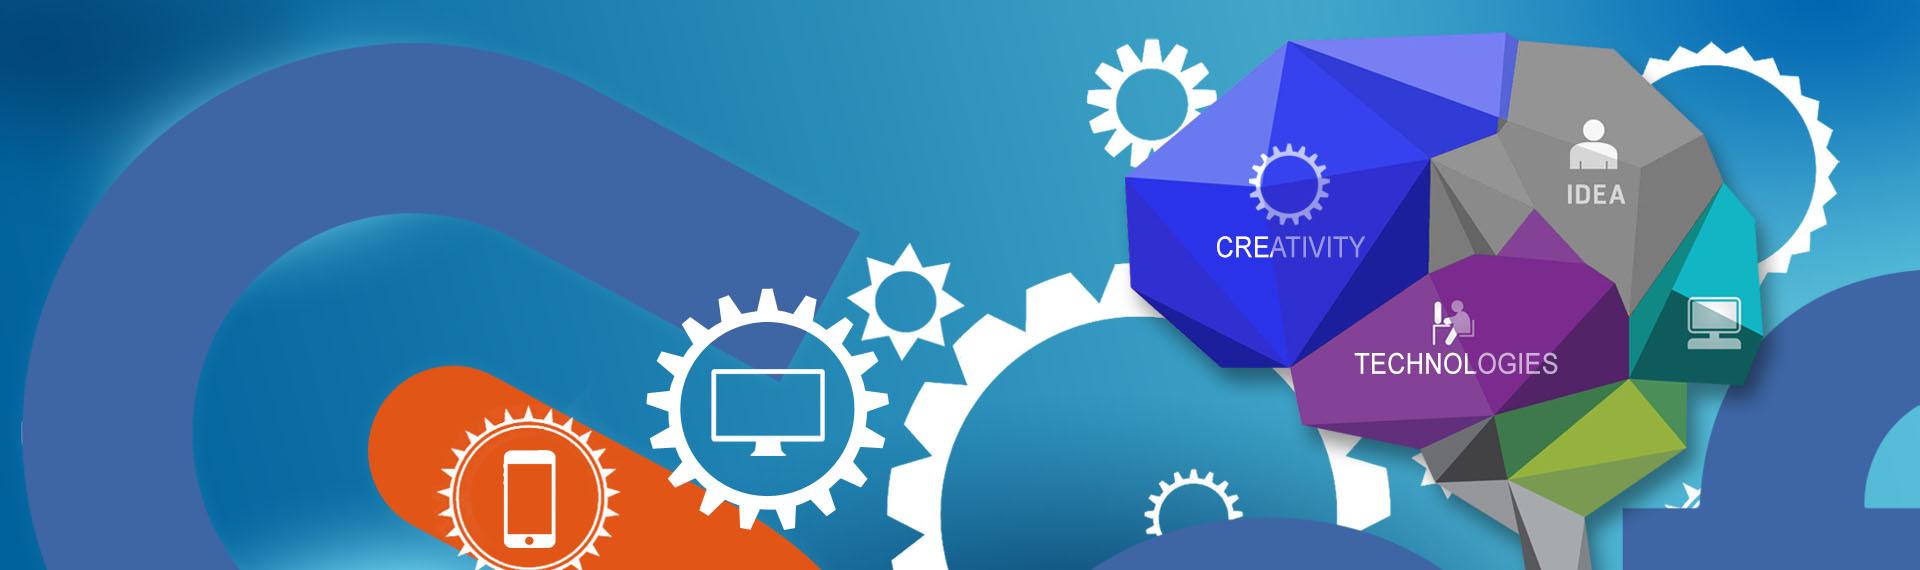 Creativity and technologies